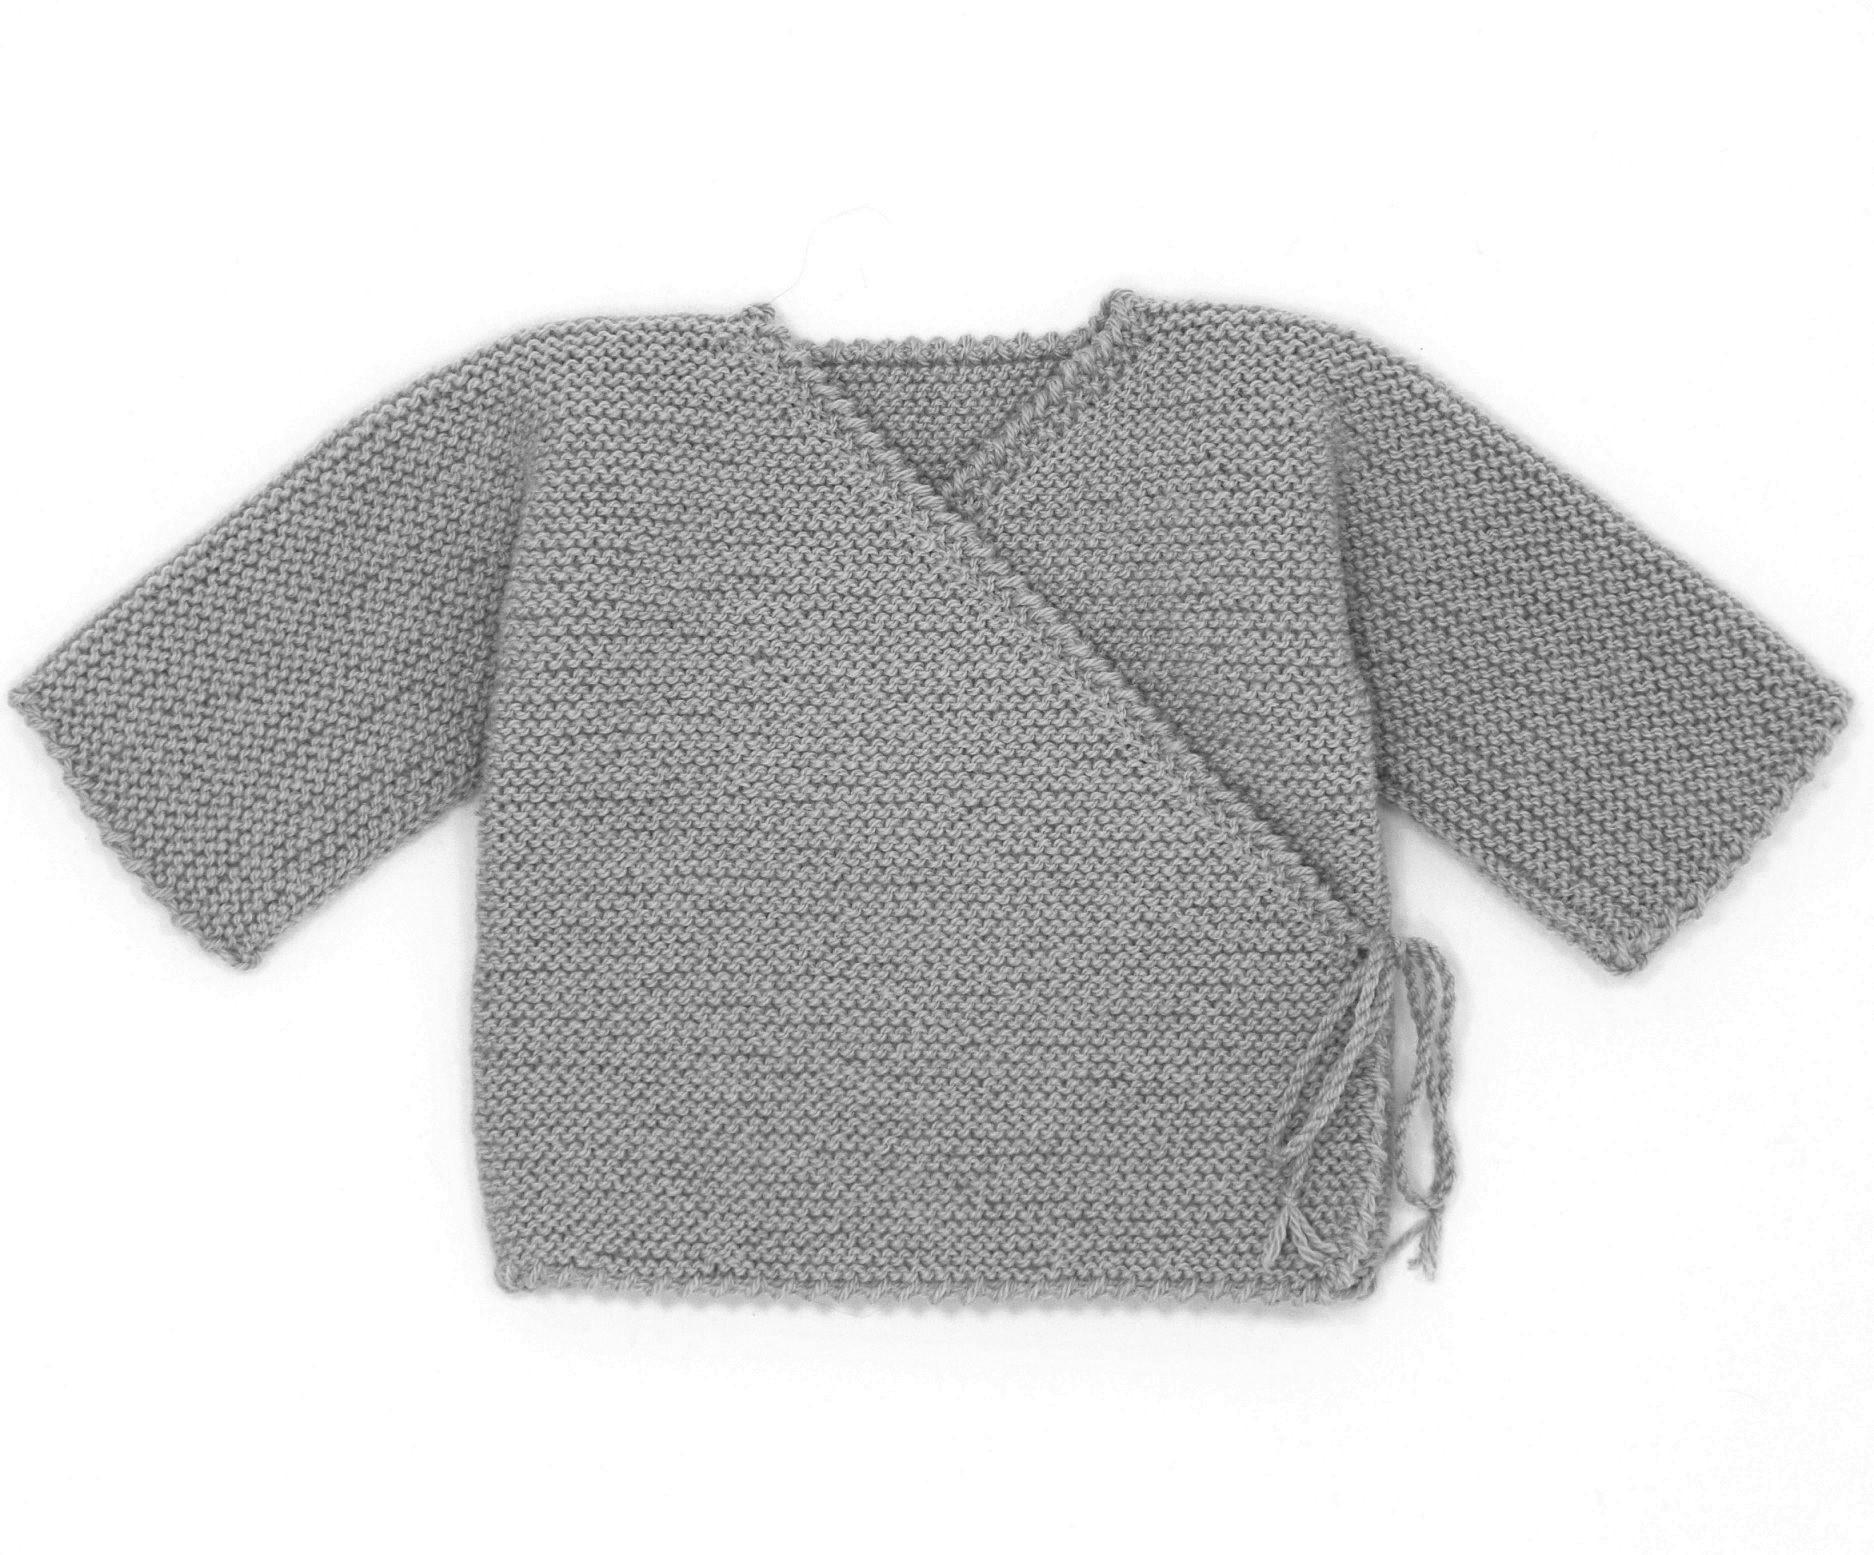 Brassiere bebe garcon tricot kit naissance laine   Distrivet 33dadd7b6cb